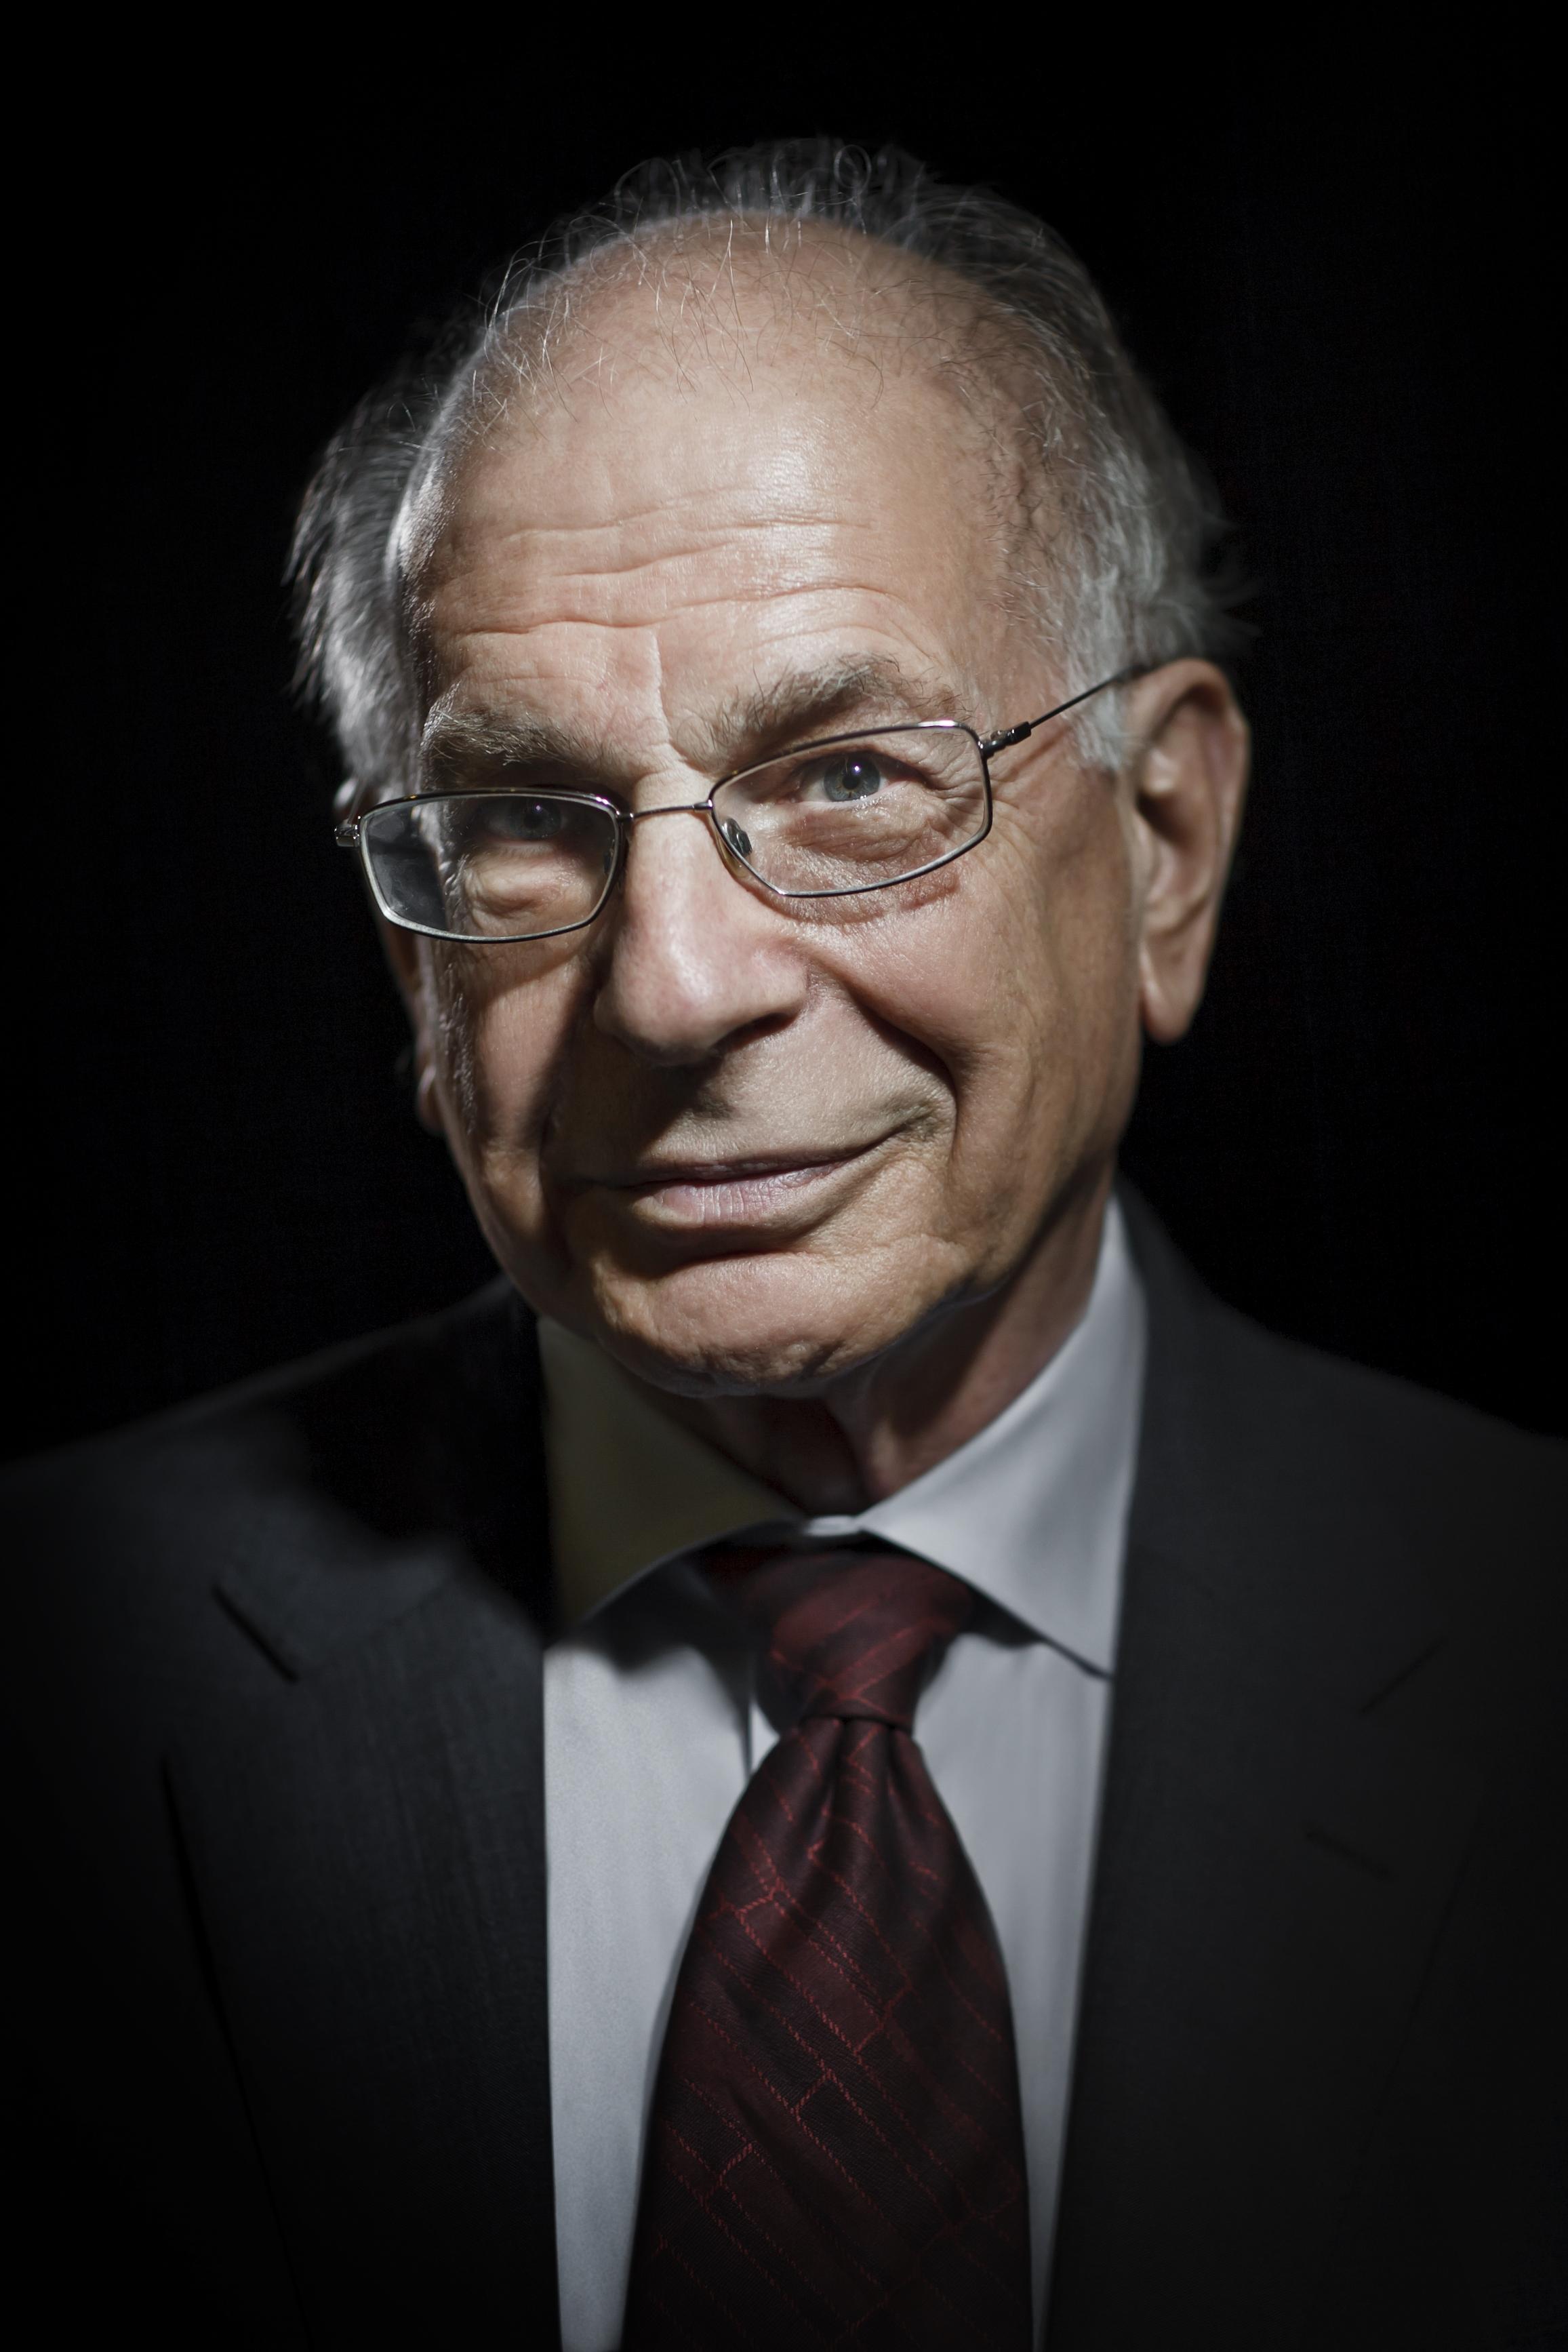 "Нобелевский лауреат Даниел Канеман умеет признавать ошибки. Аты, %username%? Источник: <a href=""http://taubcenter.org.il/daniel-kahneman"" target=""_blank"">Taub Center</a>."